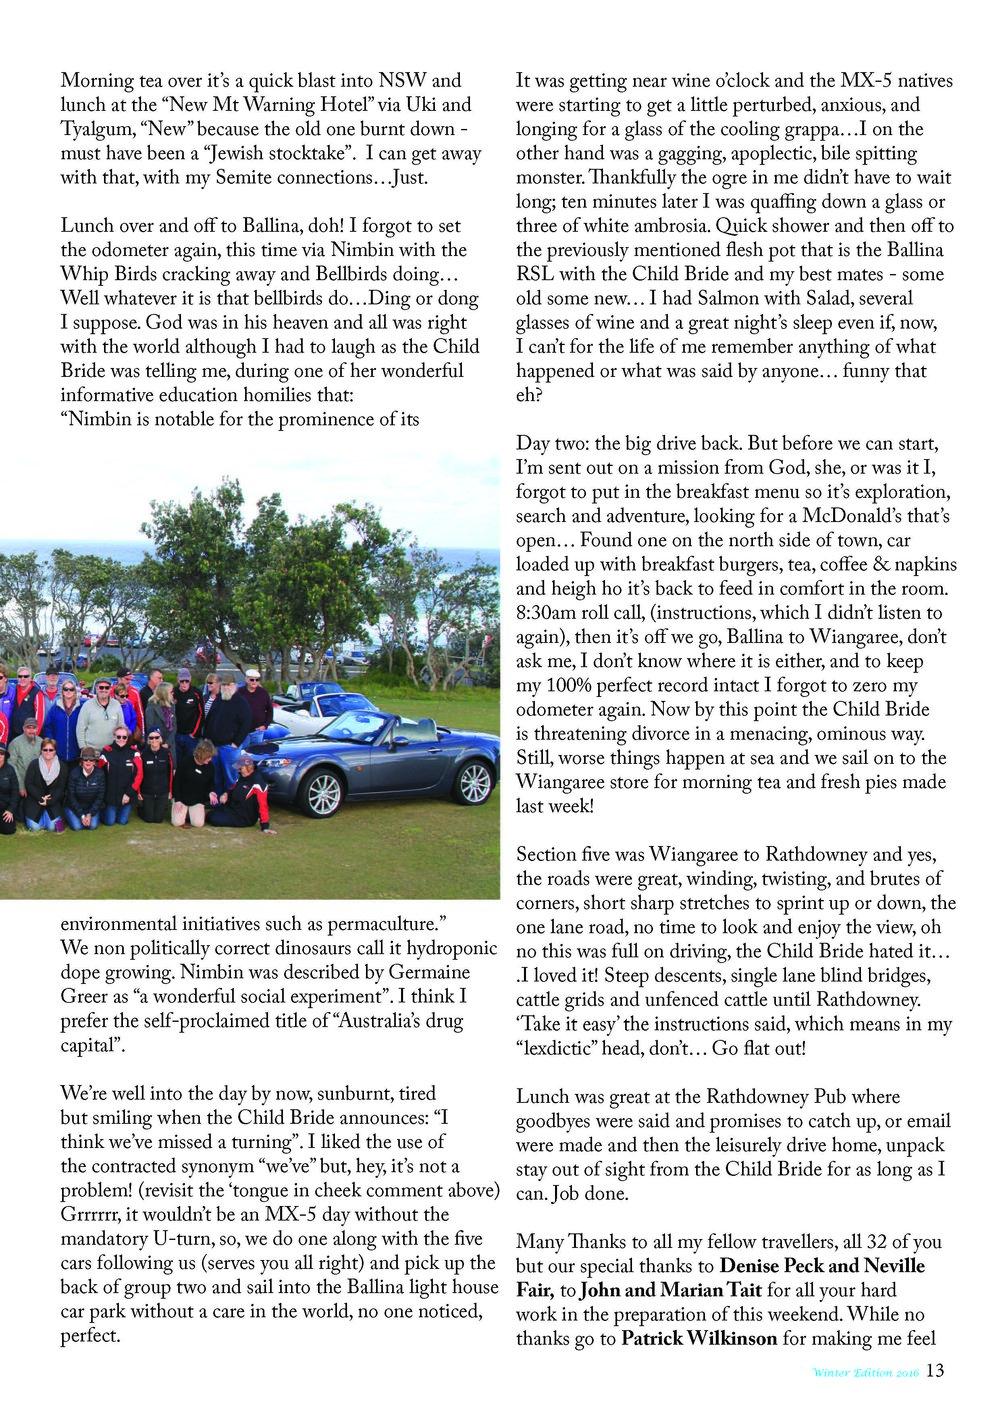 RTRWinter 2016 _Page_13.jpg